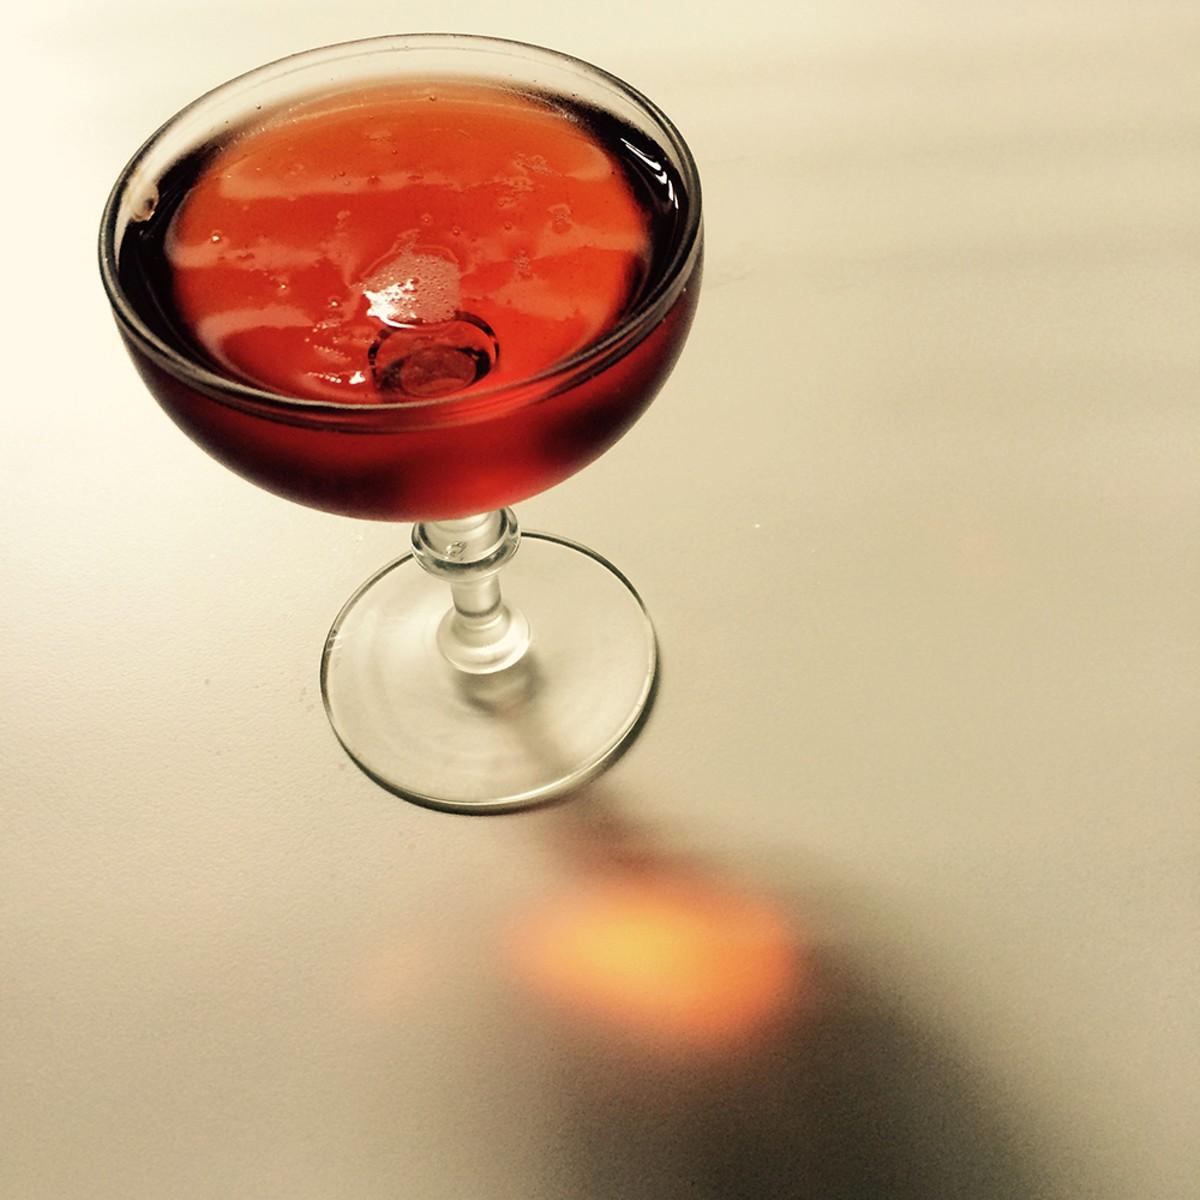 1000w_6-2015_remix_cocktail.jpg